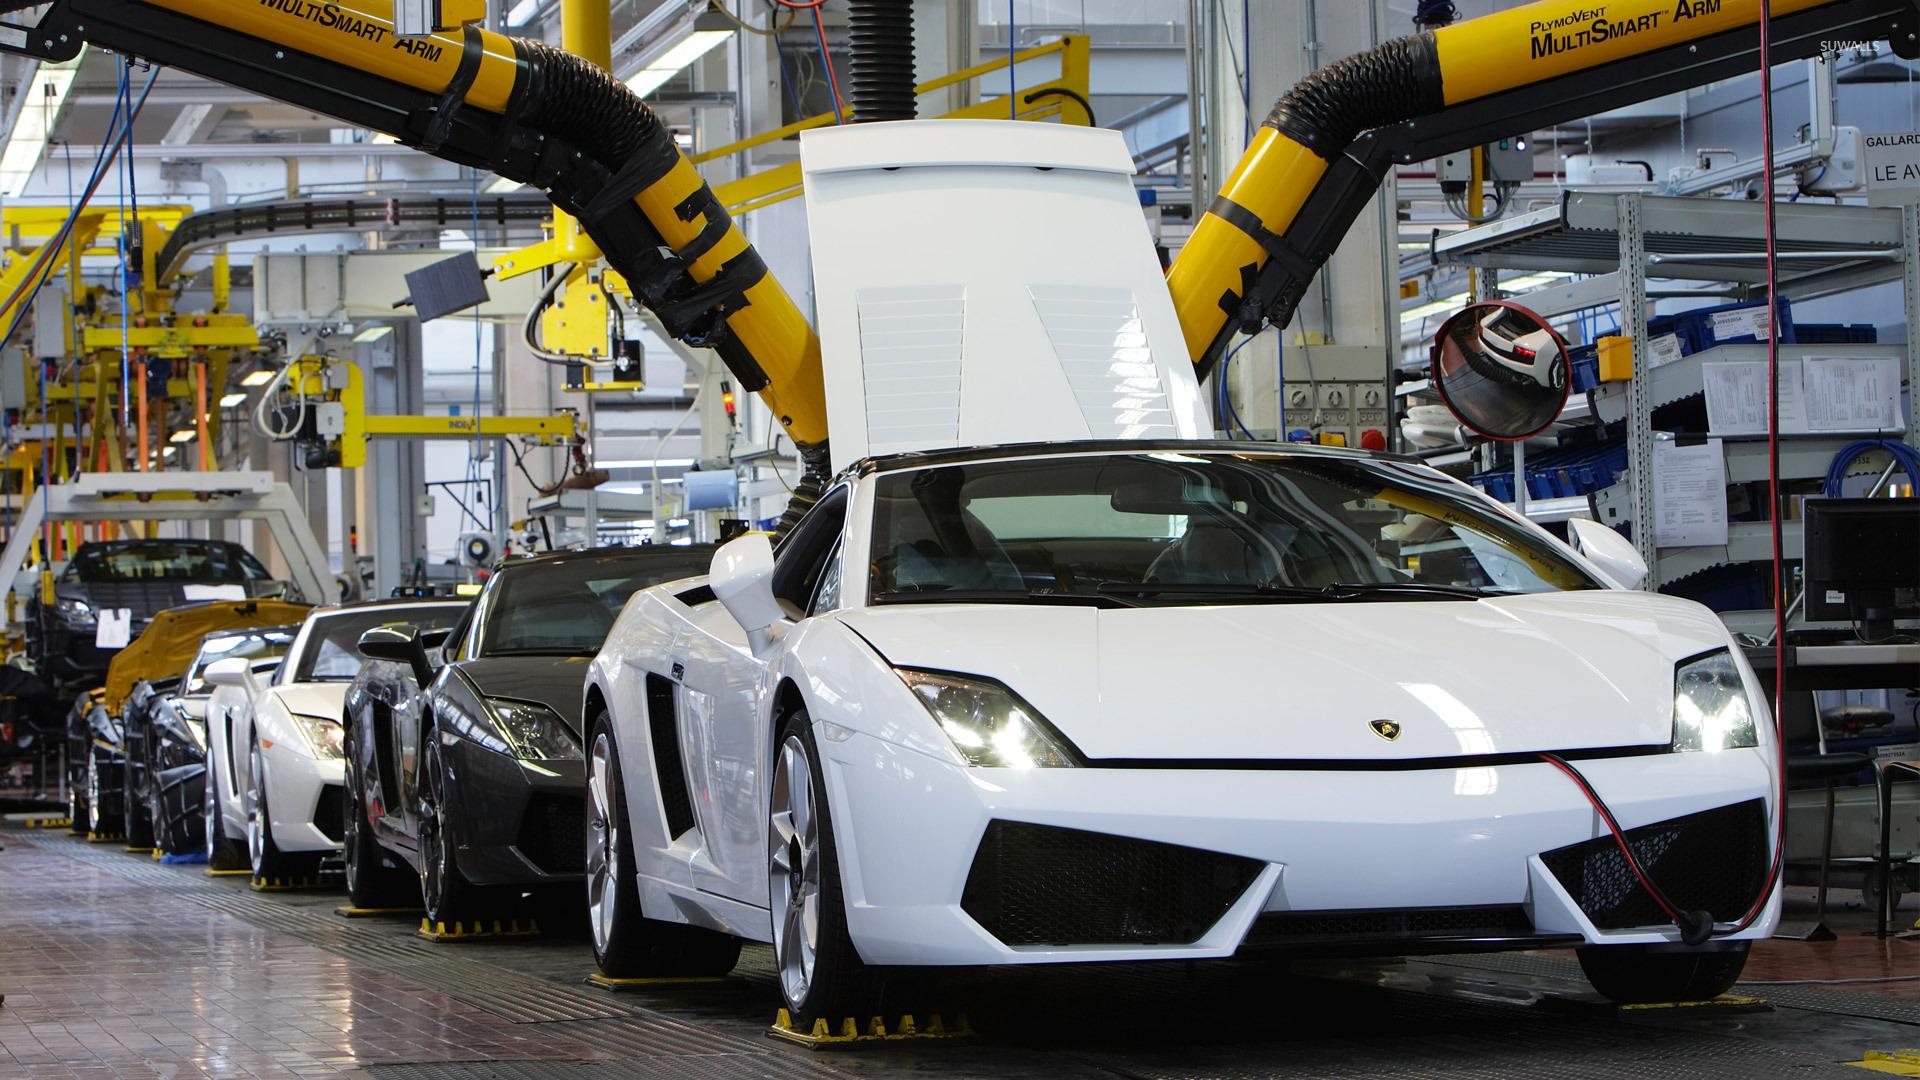 Benz Car Wallpapers Free Download Lamborghini Assembly Line Wallpaper Car Wallpapers 33020